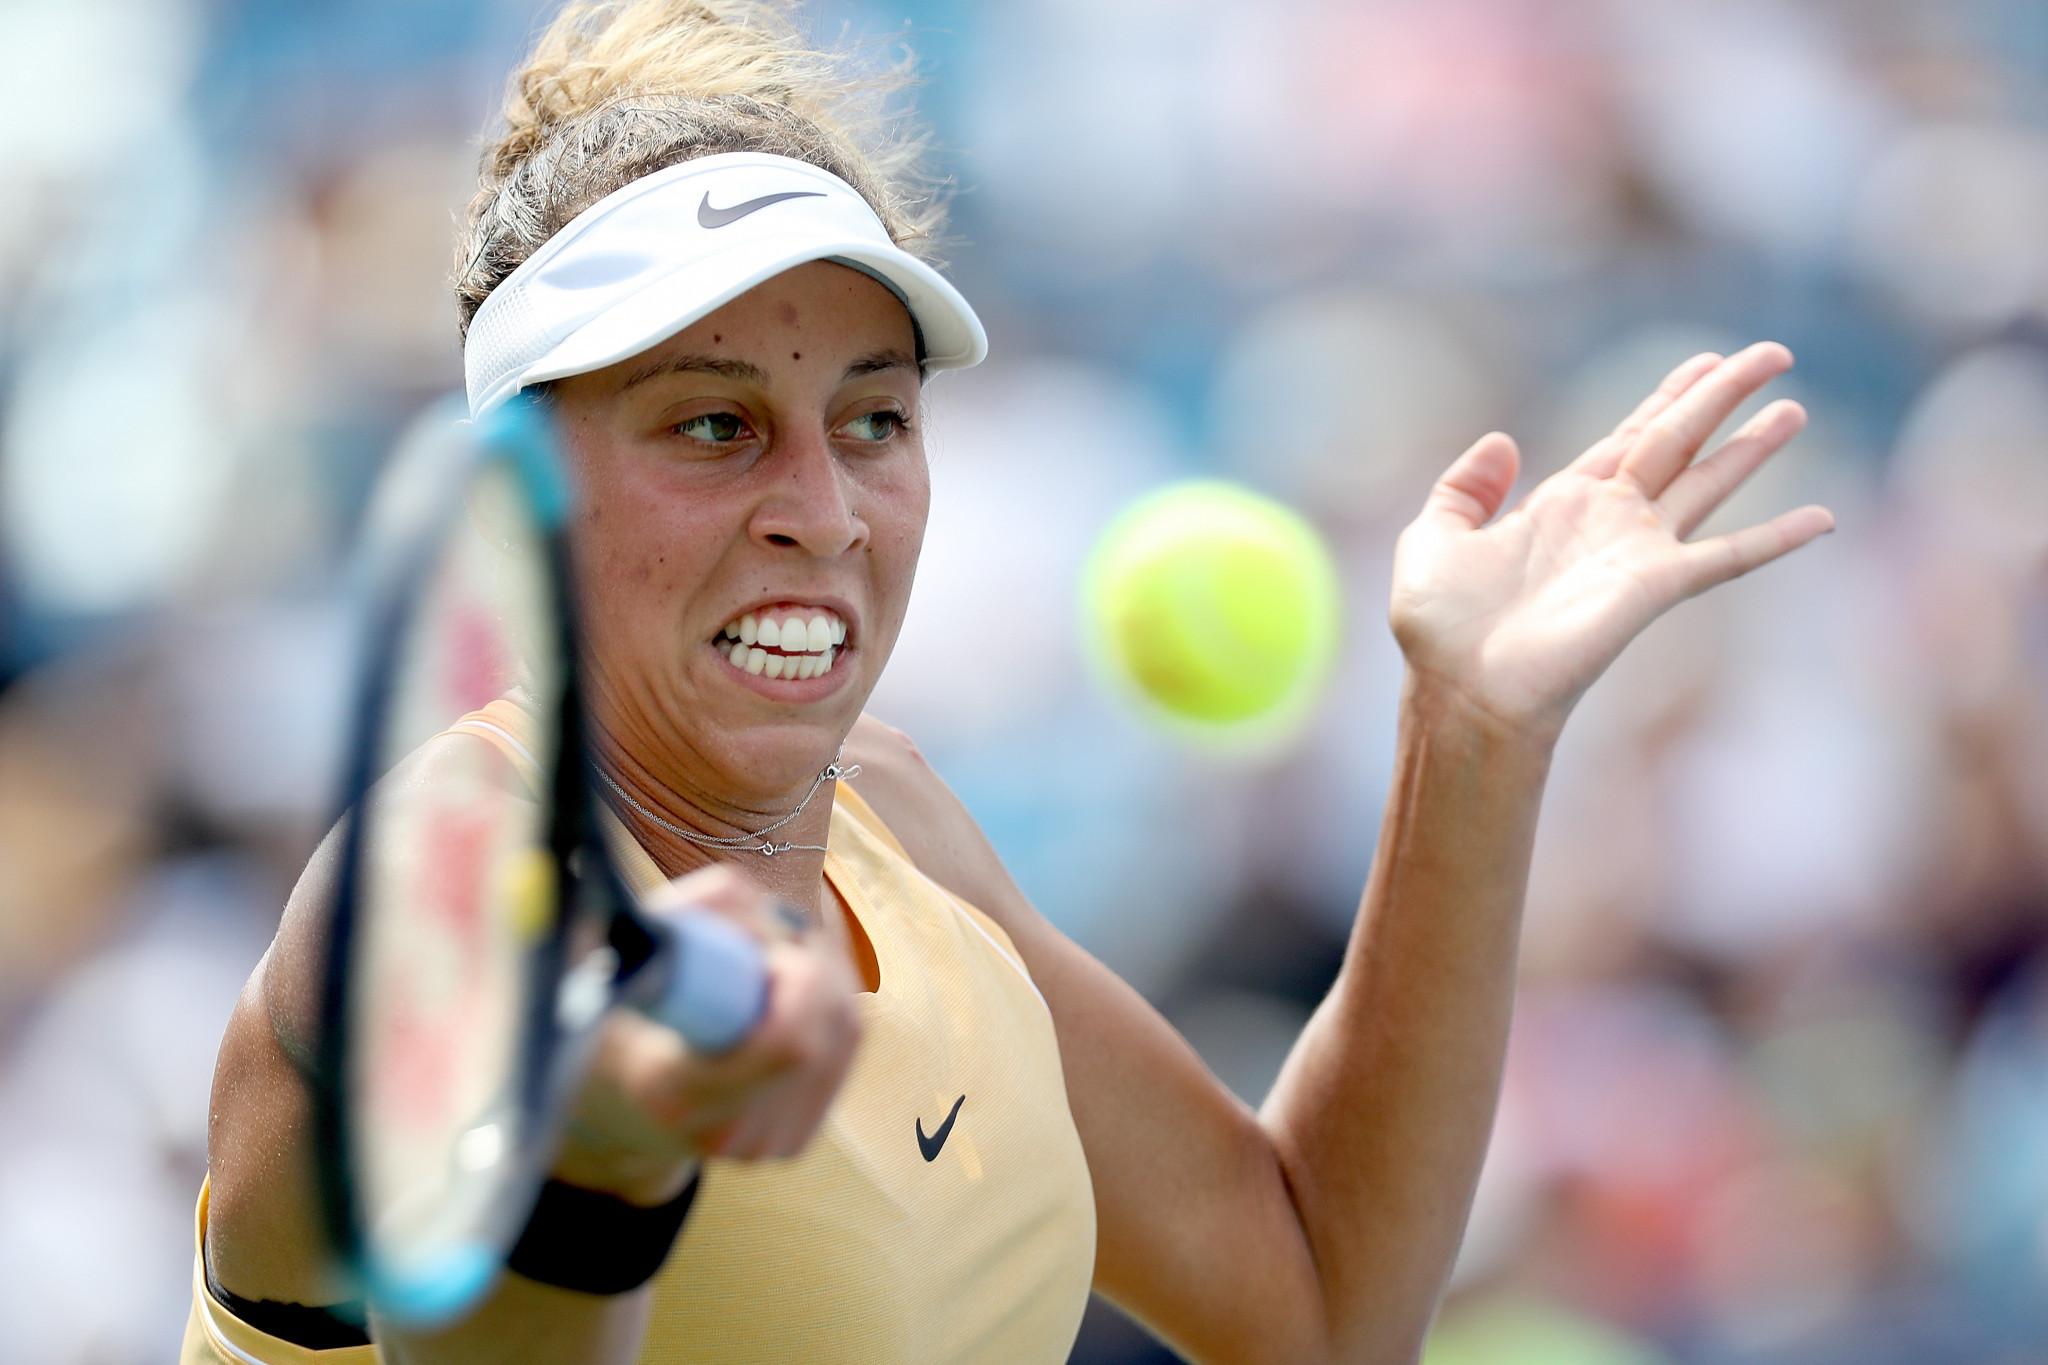 The United States' Madison Keys beat Russia's Svetlana Kuznetsova in the women's final ©Getty Images